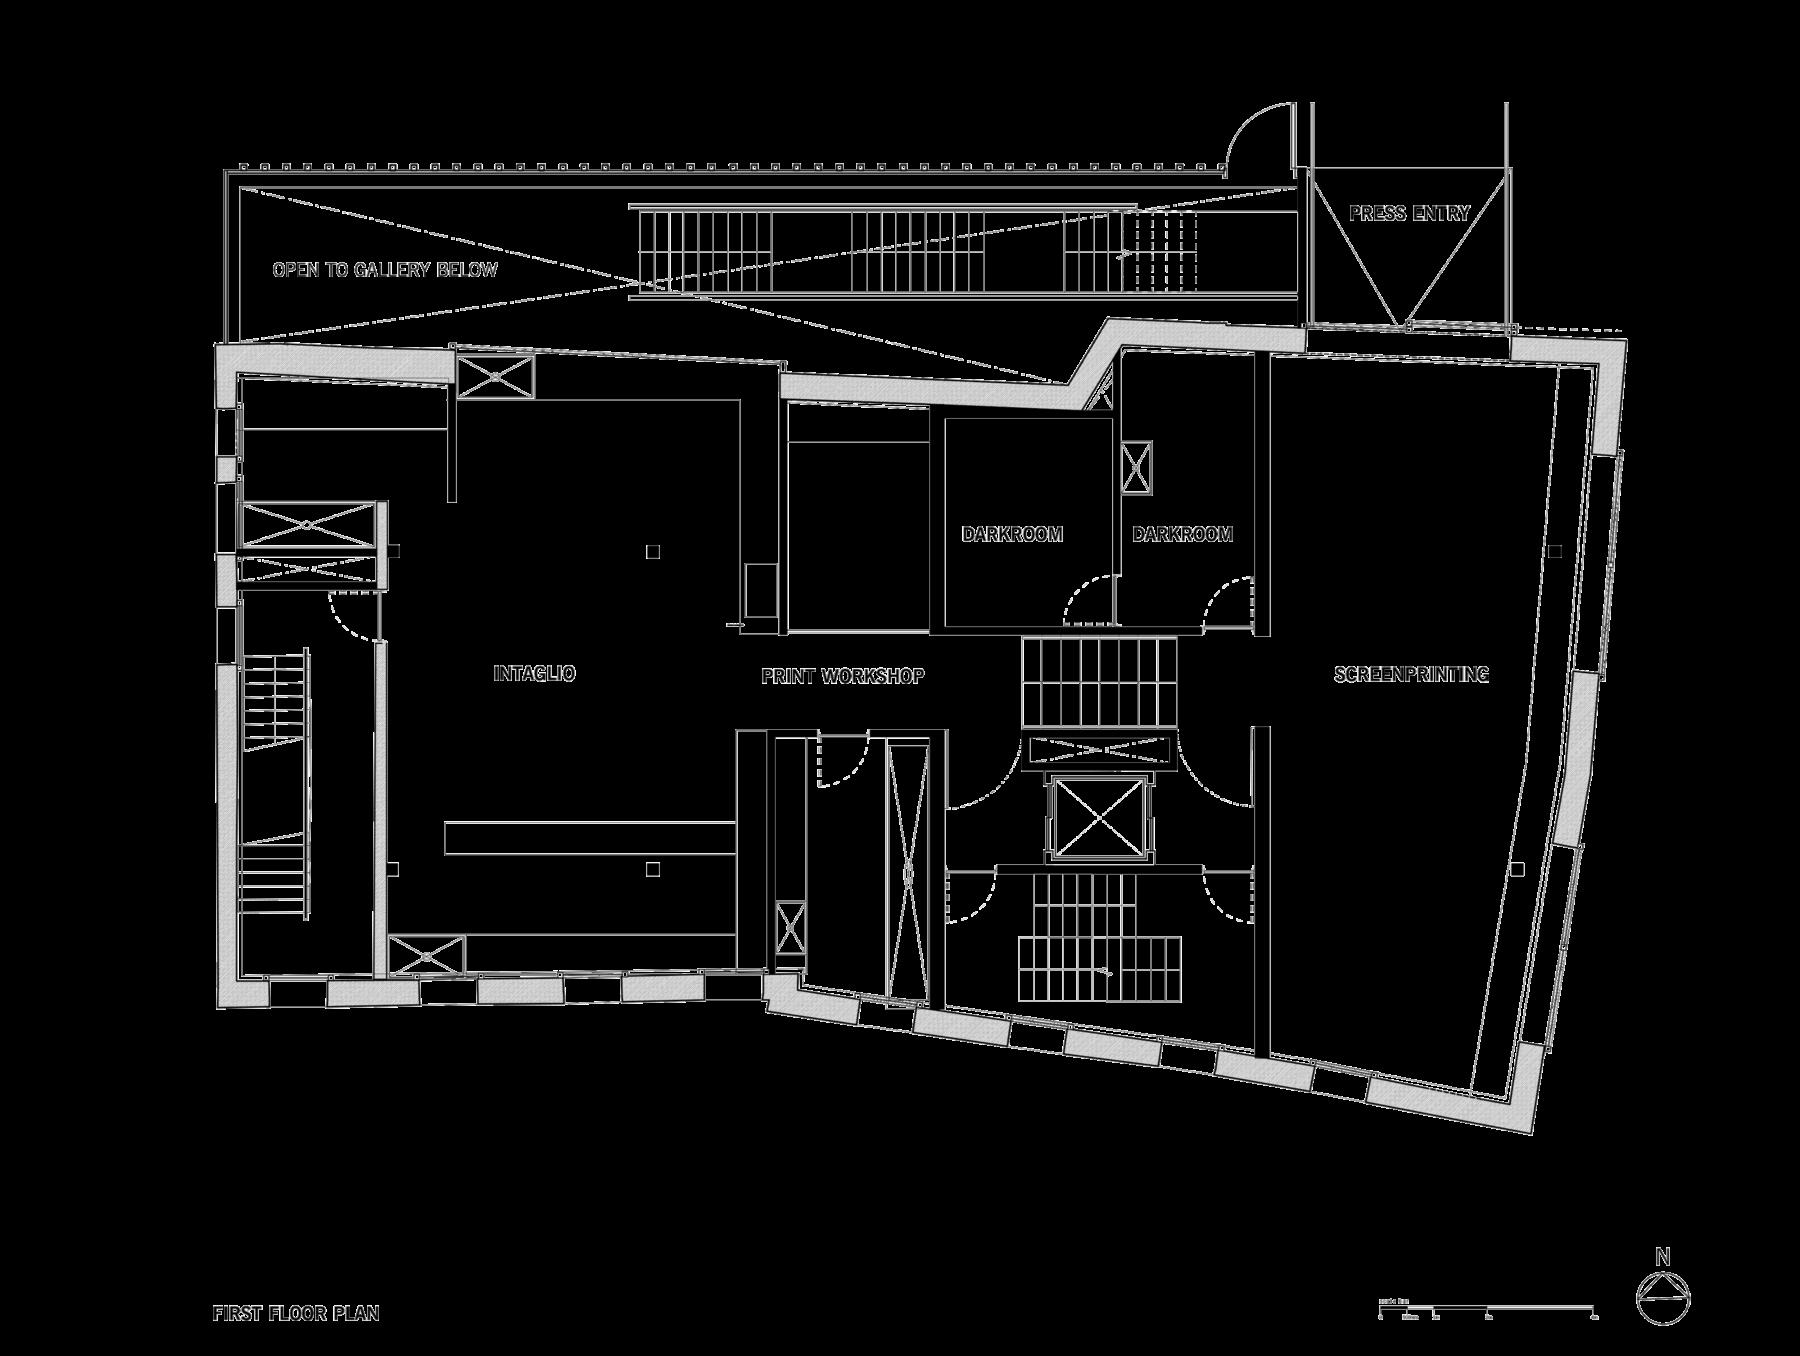 Sarah-Wigglesworth-Architects Swansea-Print-Works Drawing Plan 3600